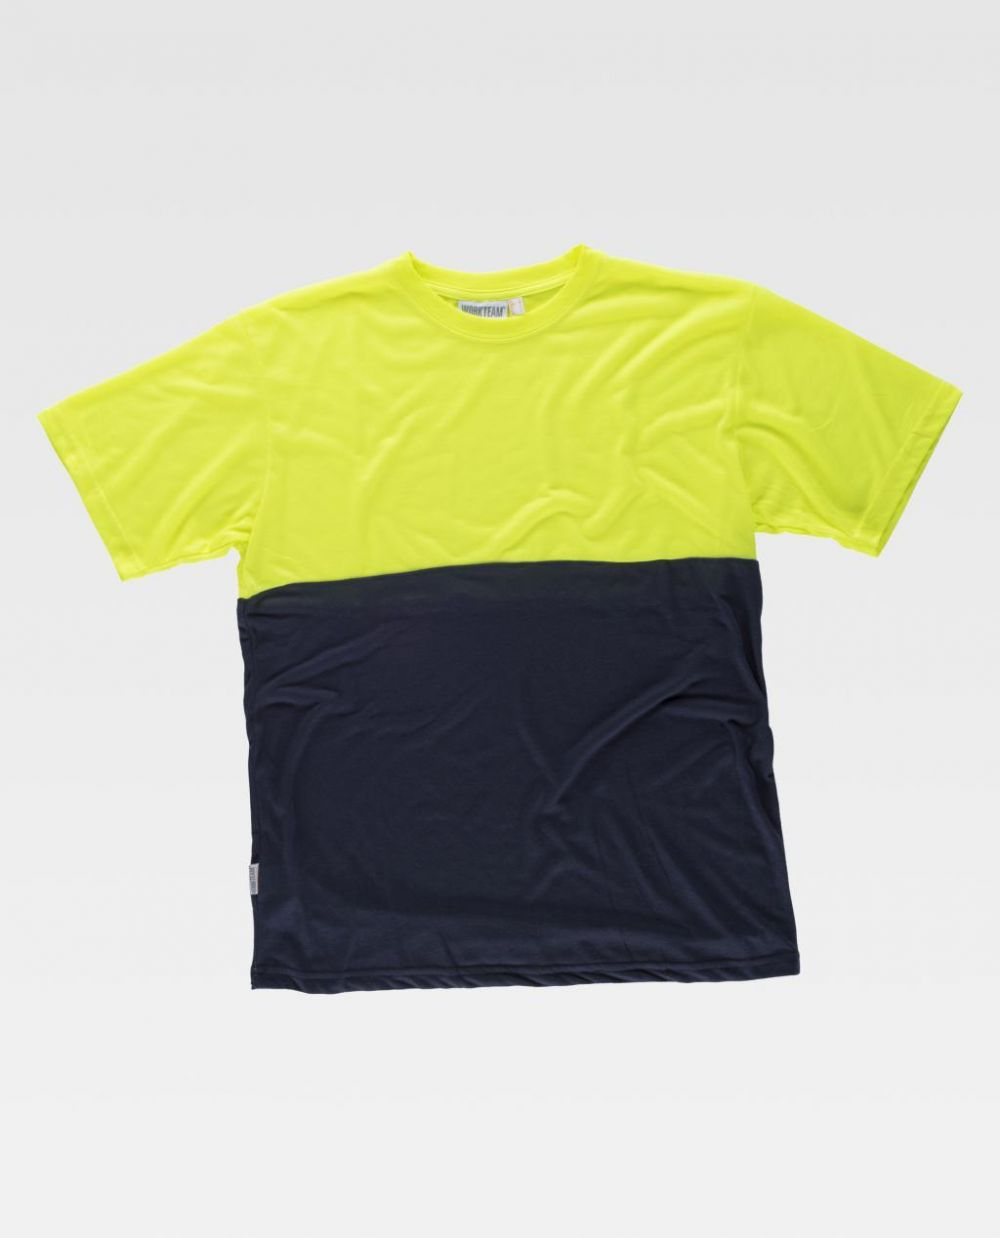 Camisetas reflectante workteam mc combinada alta visibilidad de poliéster vista 1